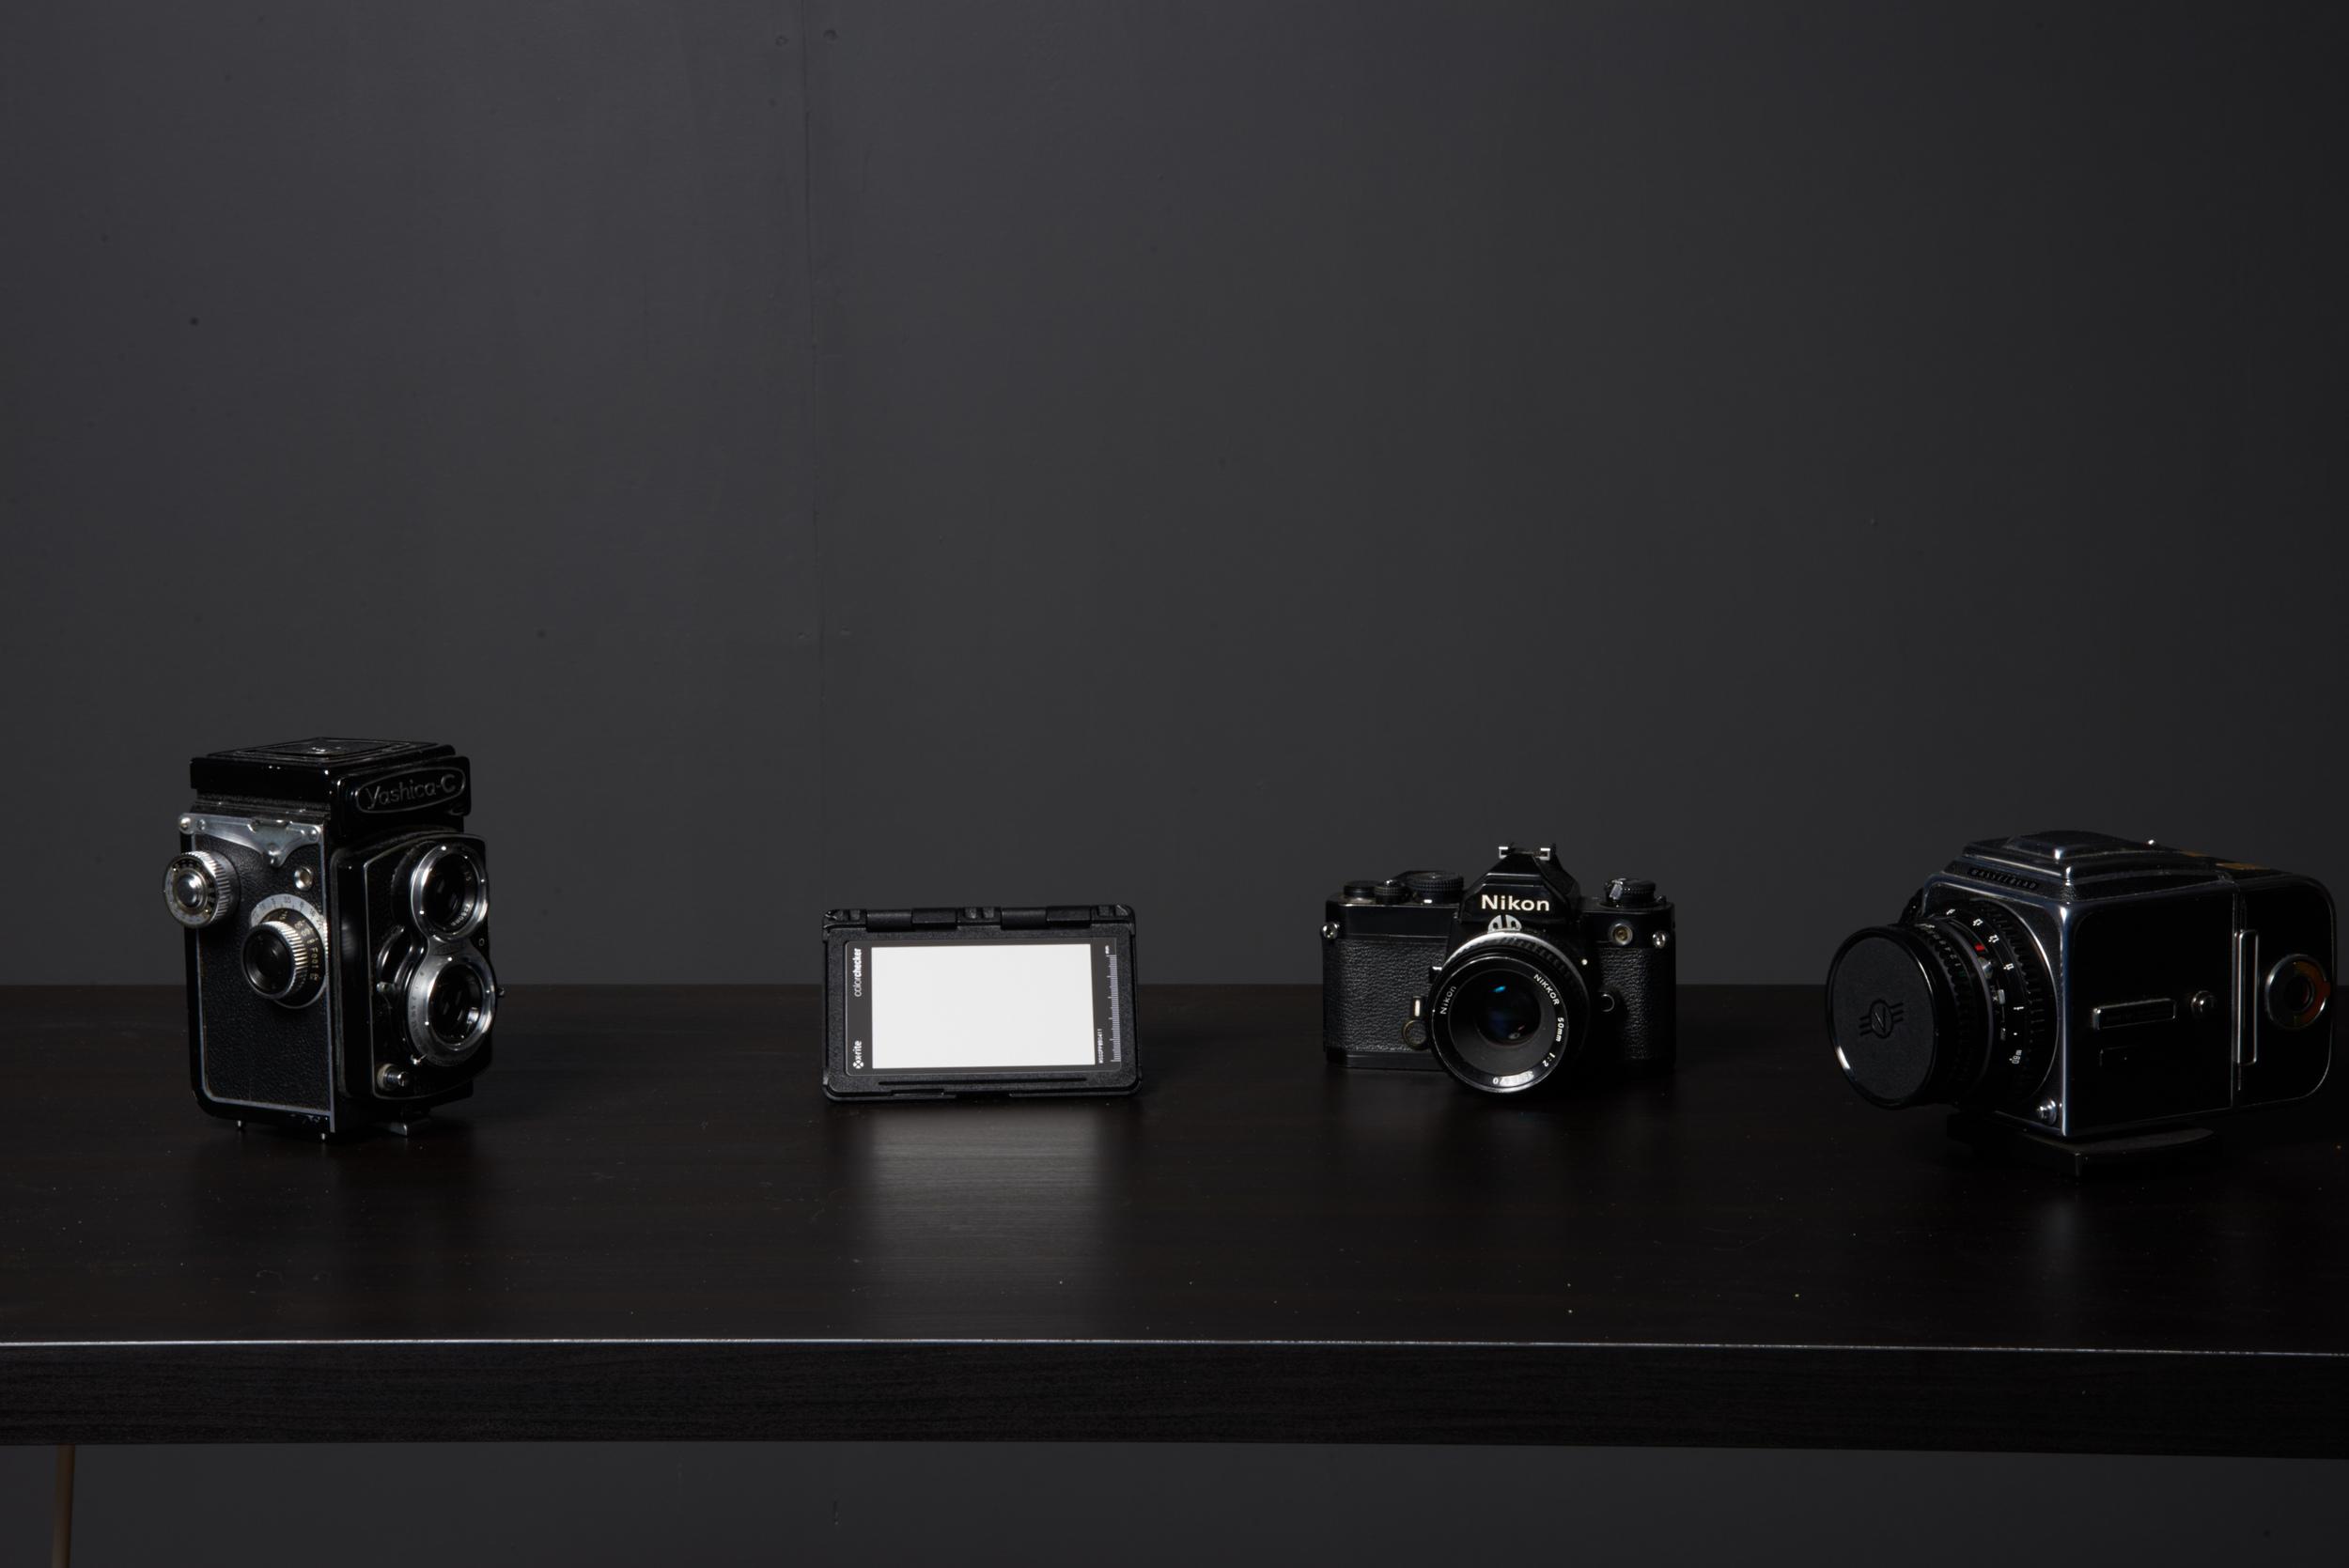 De test opstelling. Camera Nikon D610, Lens: Sigma 24-105 Art